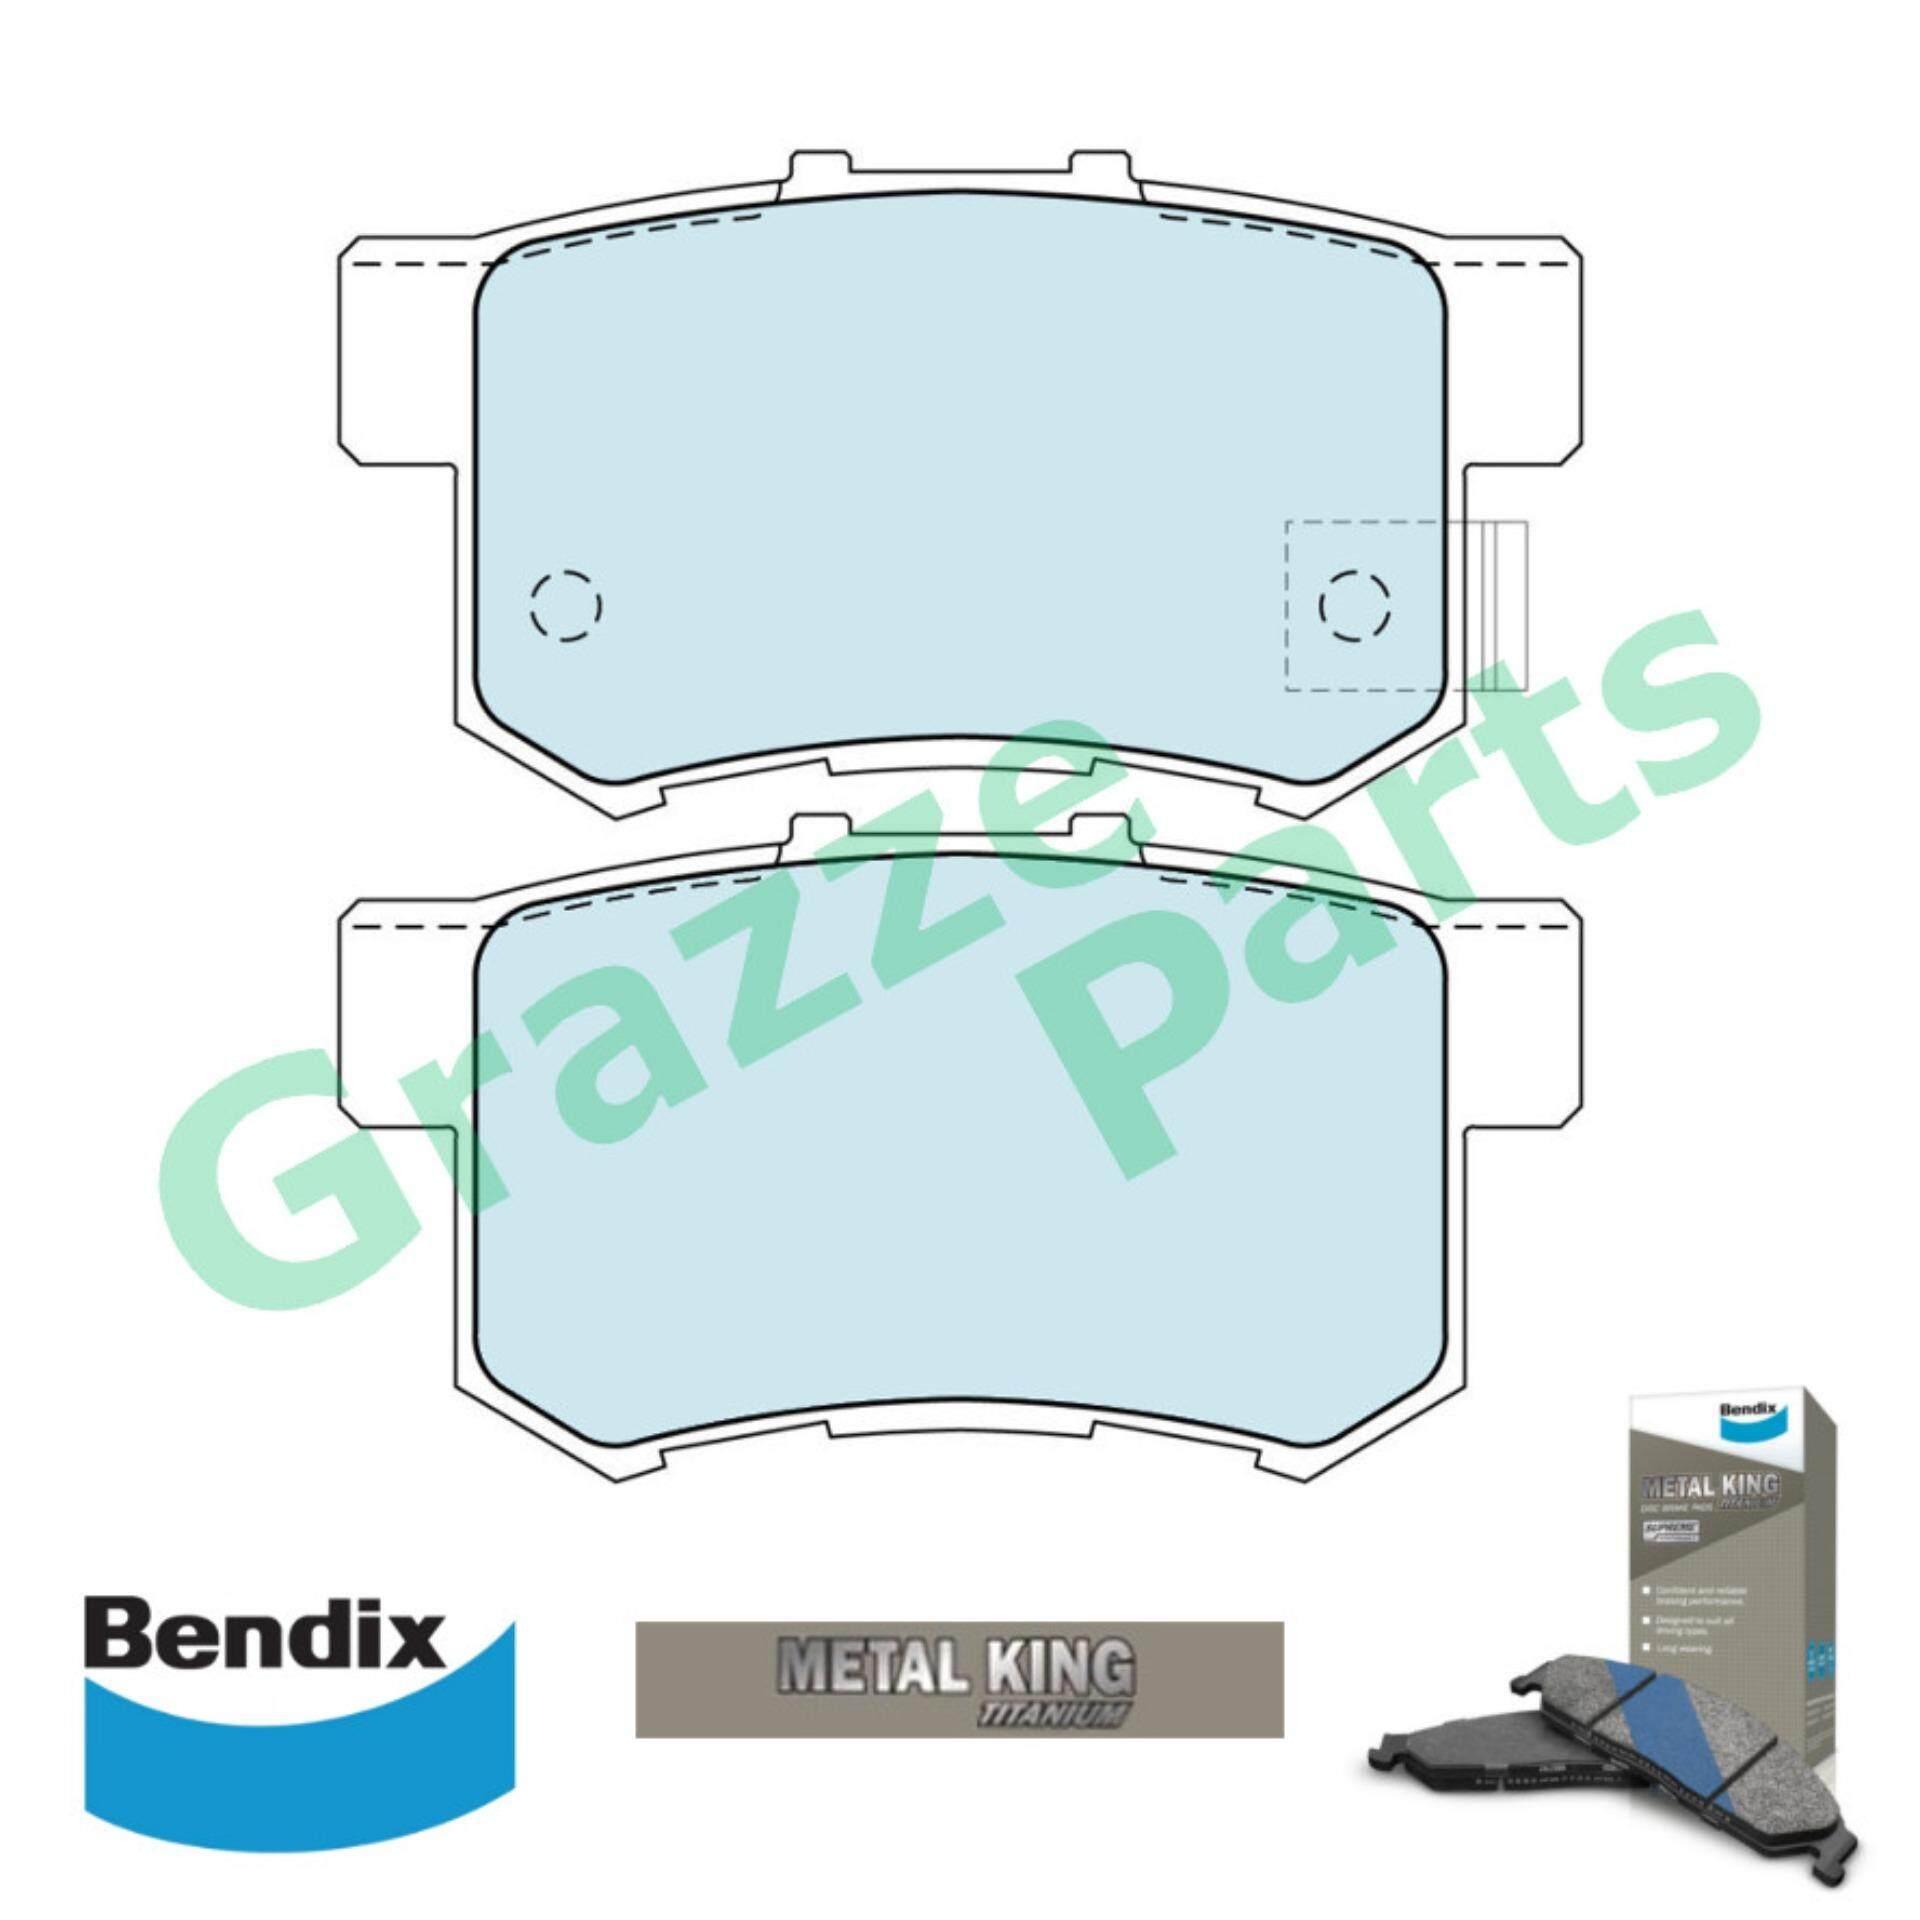 Bendix Metal King Titanium Disc Brake Pad Rear for DB1230 - Honda Accord SDA CRV S9A Stream Odyssey Legend